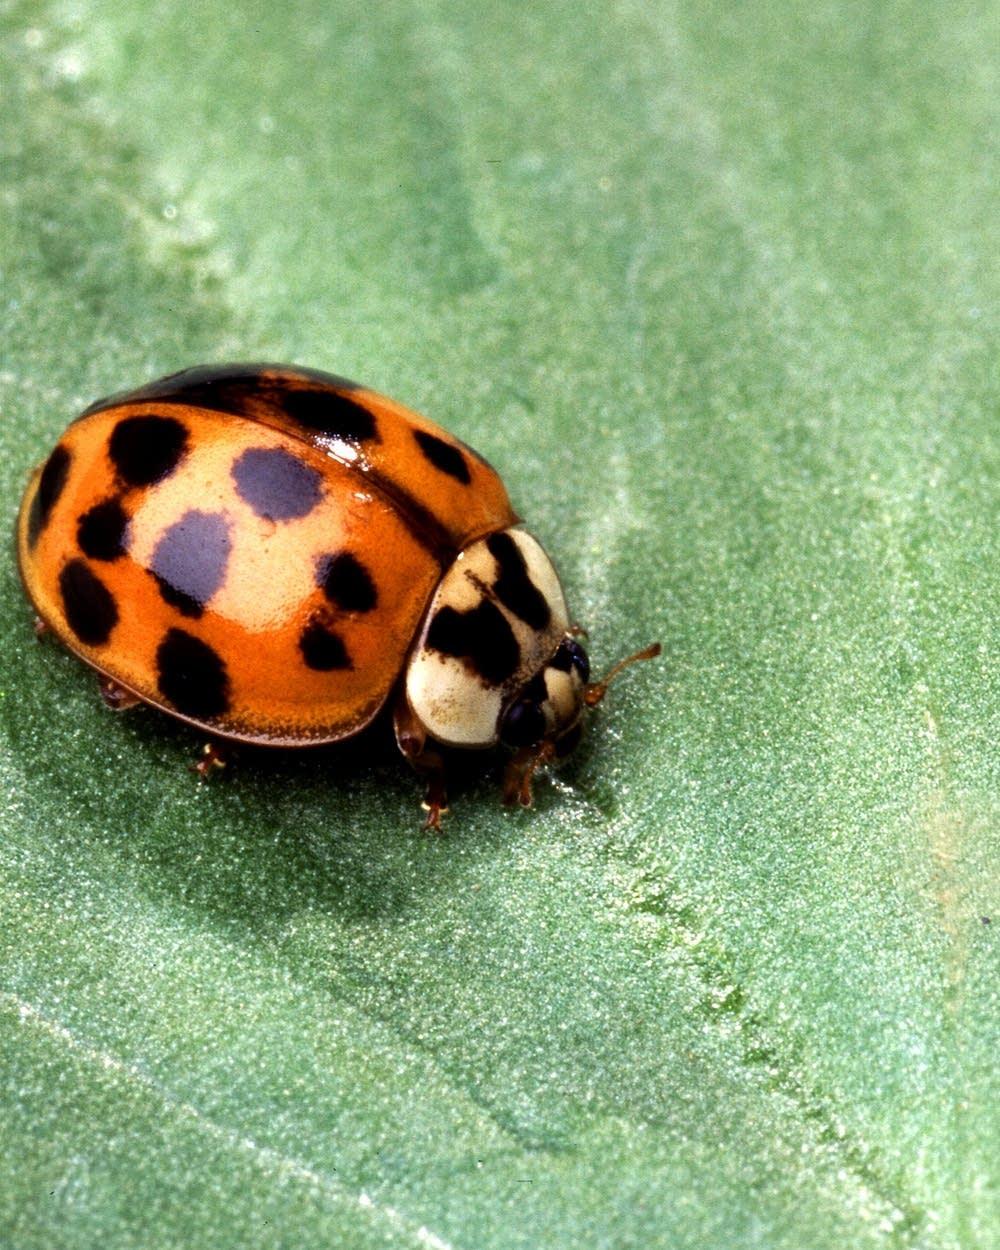 Dang Beetles Warm Weather Triggers Asian Ladybug Breakout Mpr News